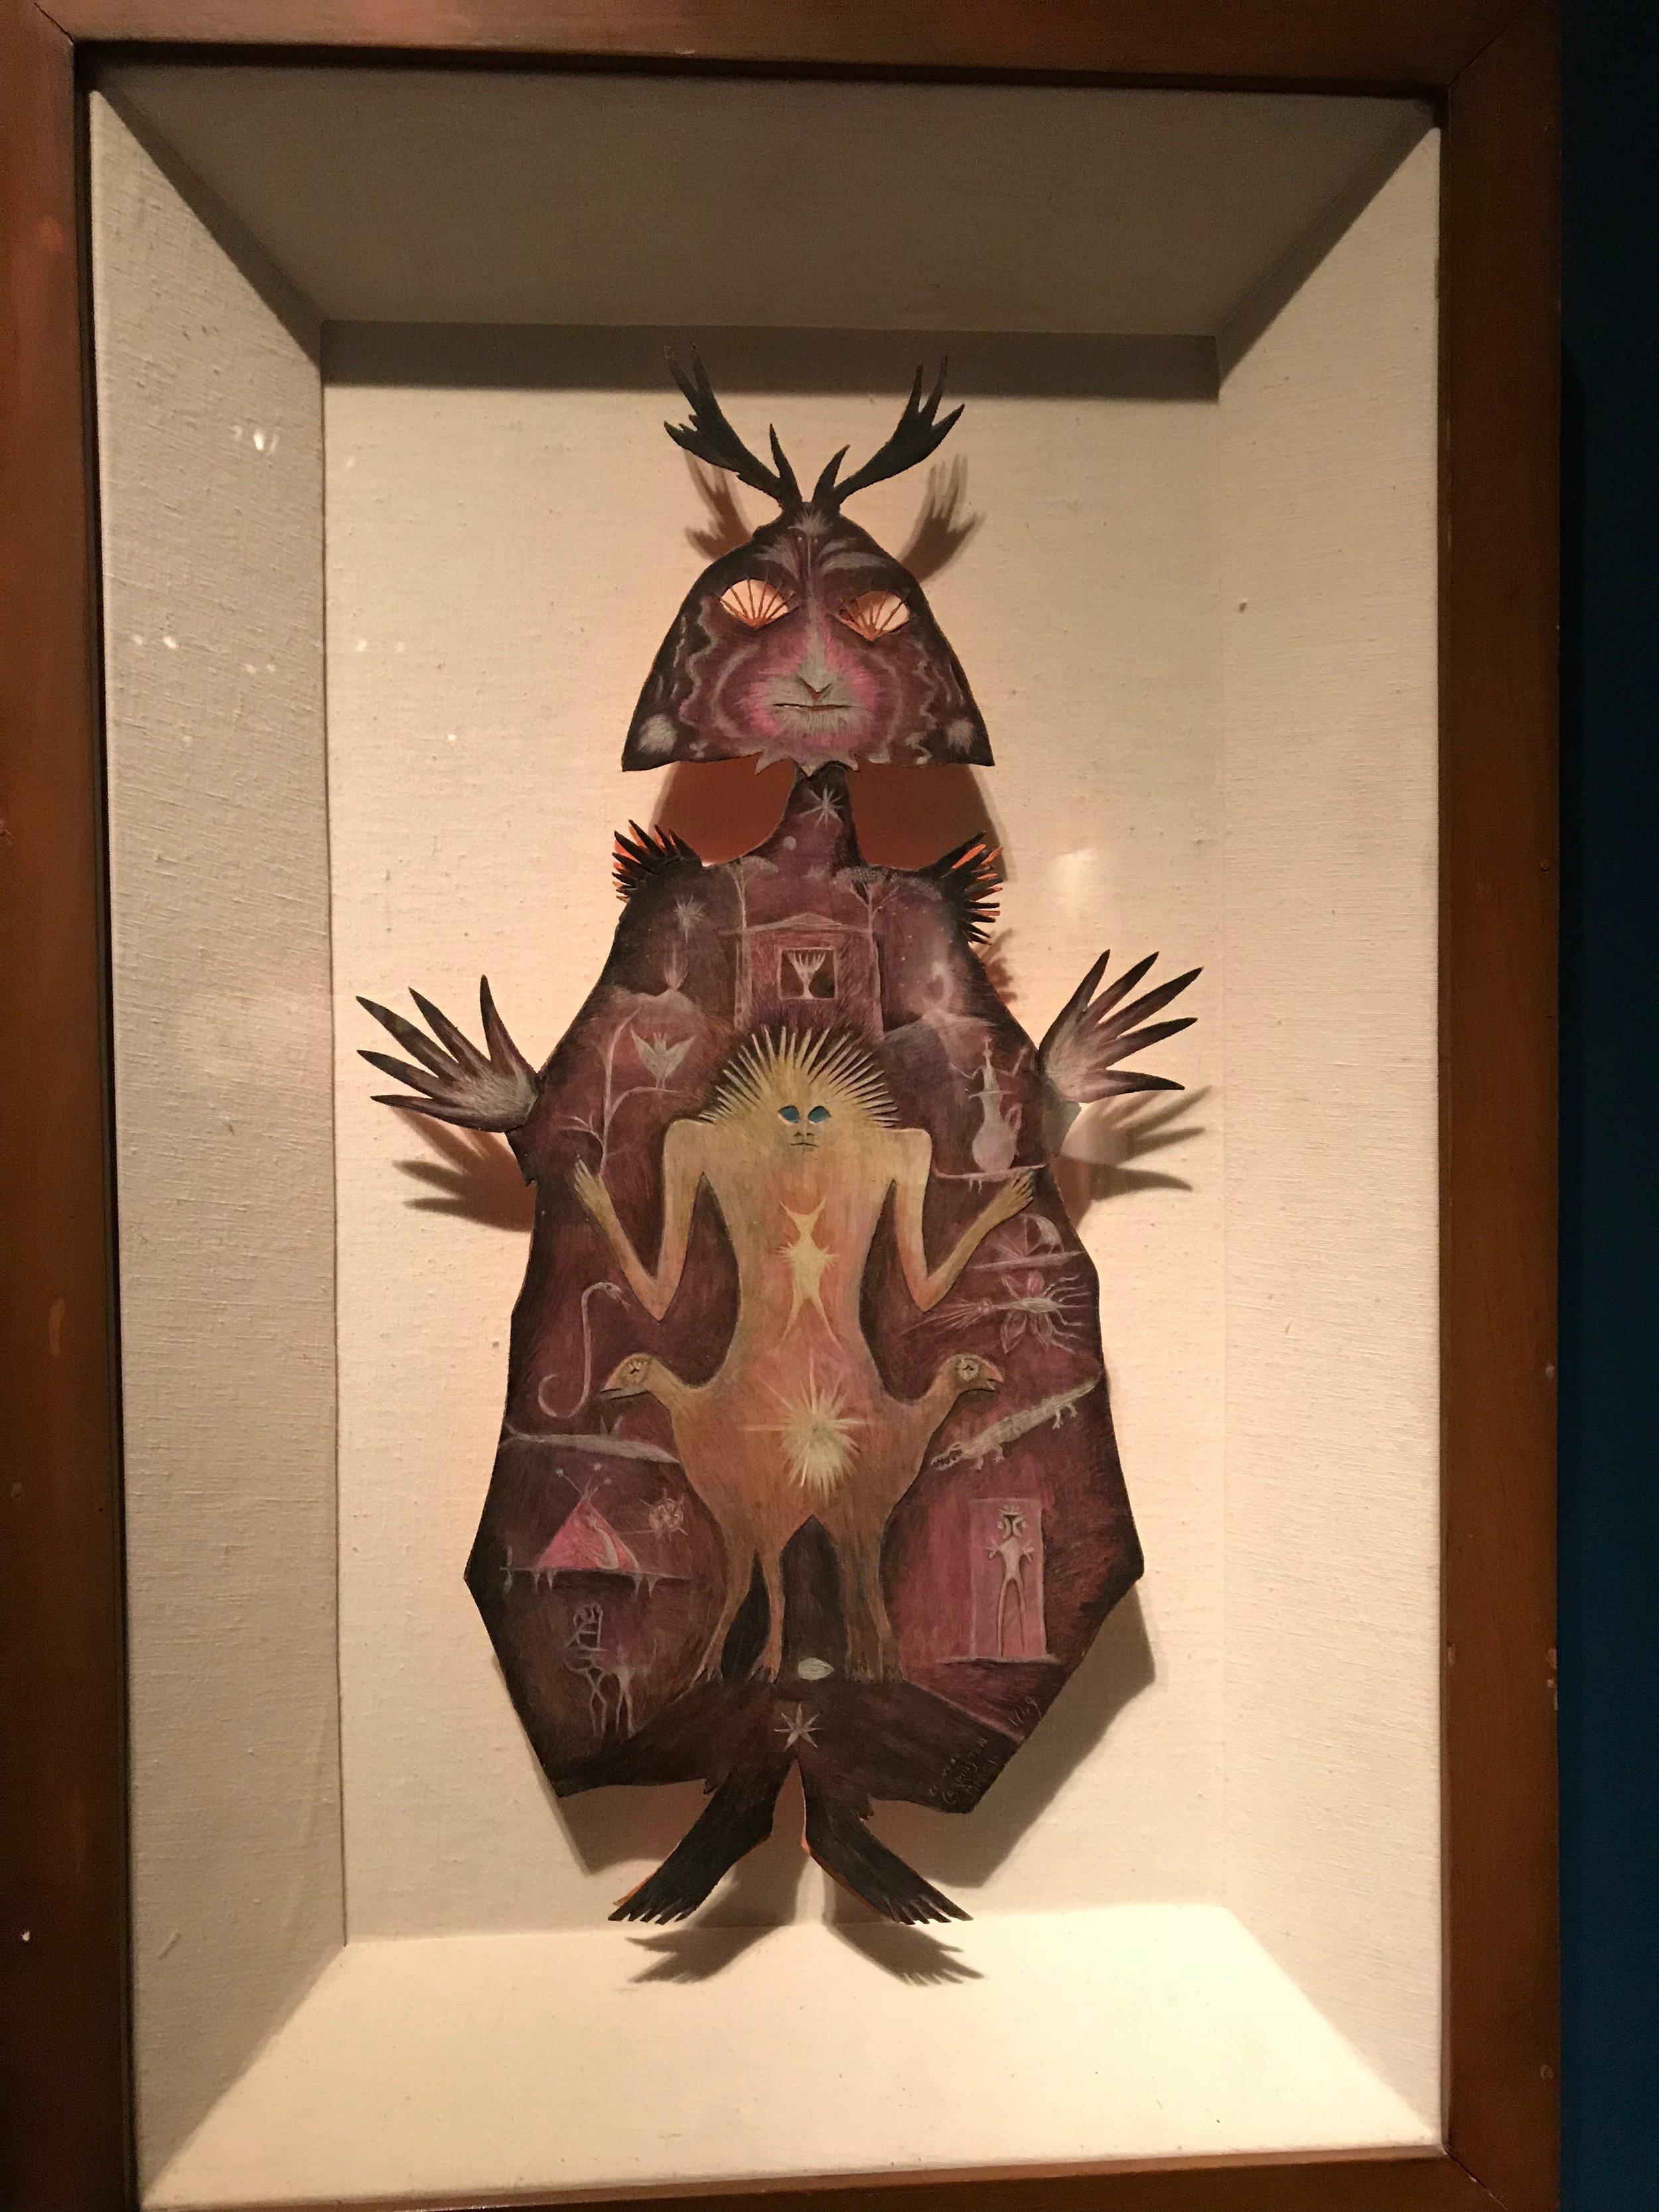 Object by Leonora Carrington.